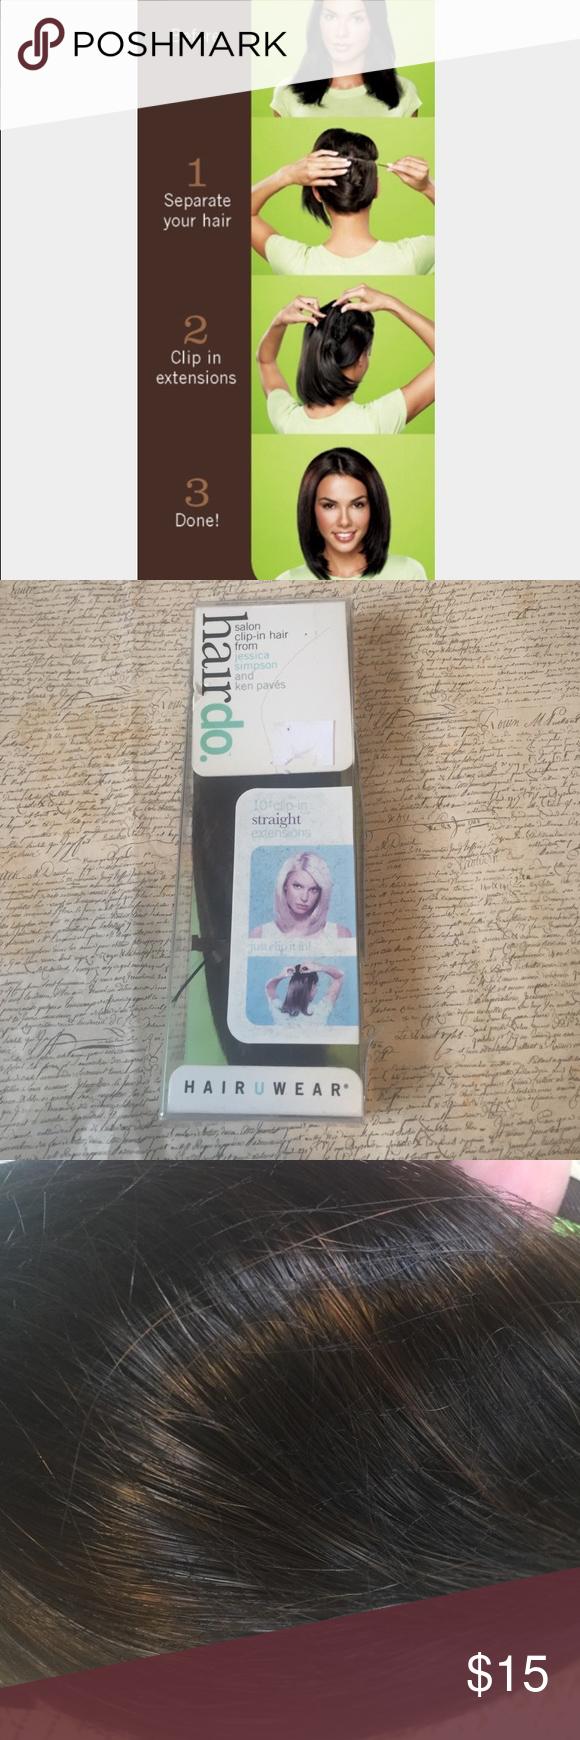 Nwt Jessica Simpson Hair Extensions Jessica Simpson Hair